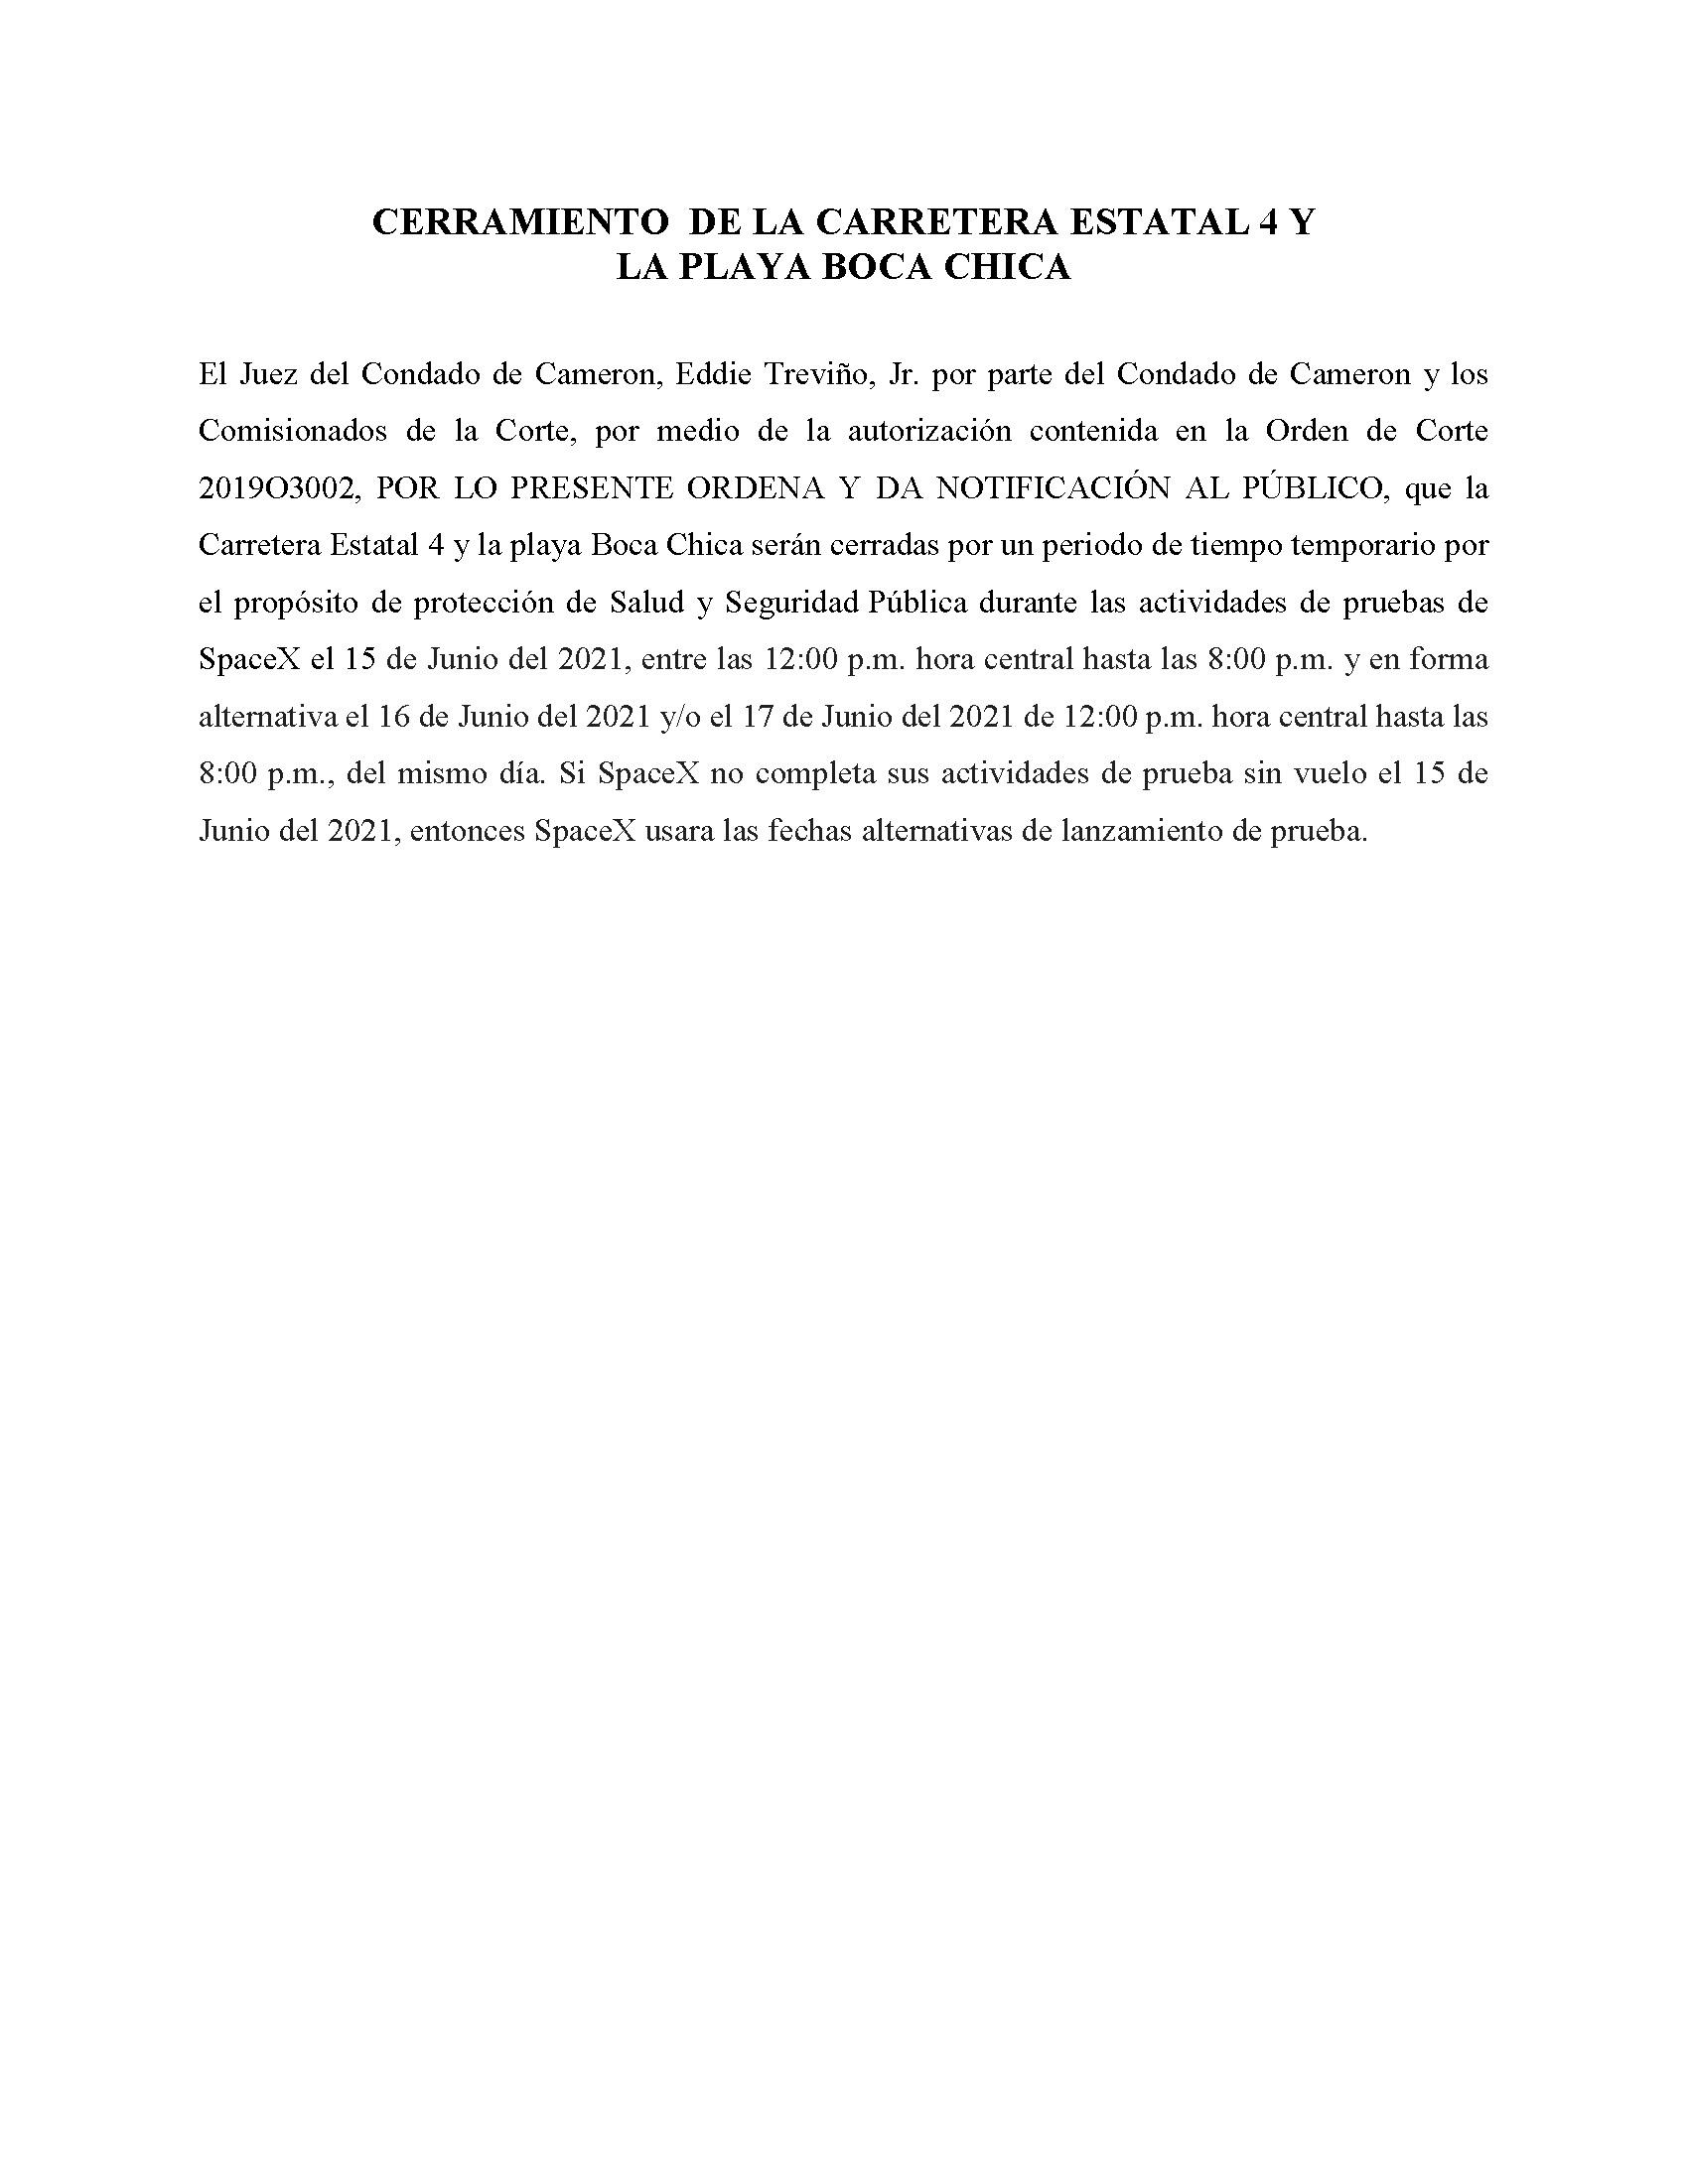 ORDER.CLOSURE OF HIGHWAY 4 Y LA PLAYA BOCA CHICA.SPANISH.06.15.2021